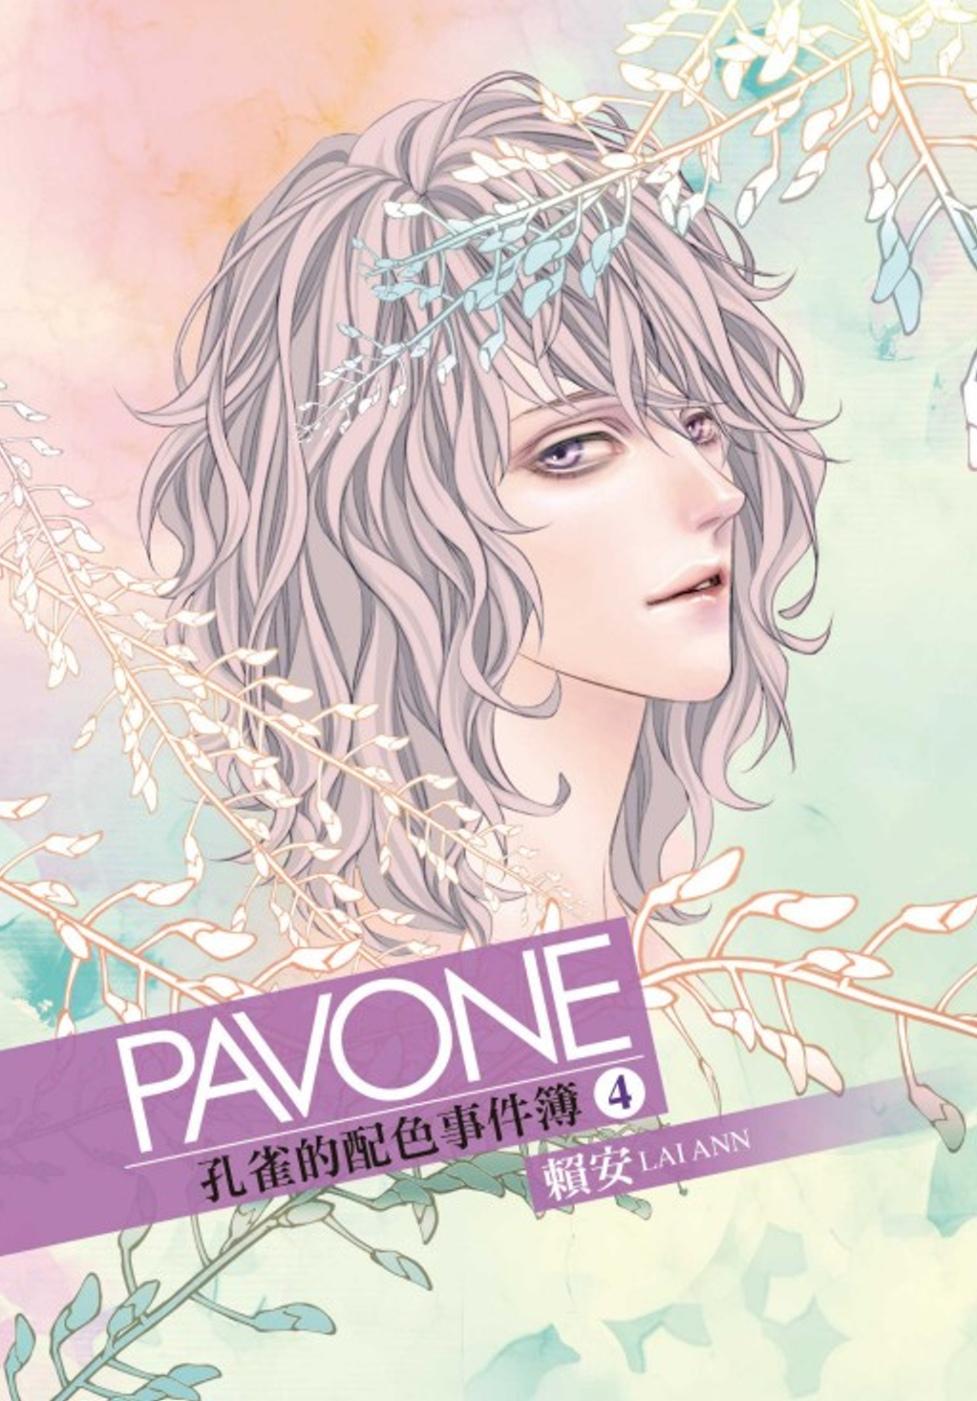 PAVONE孔雀的配色事件簿 4 (首刷附錄版)